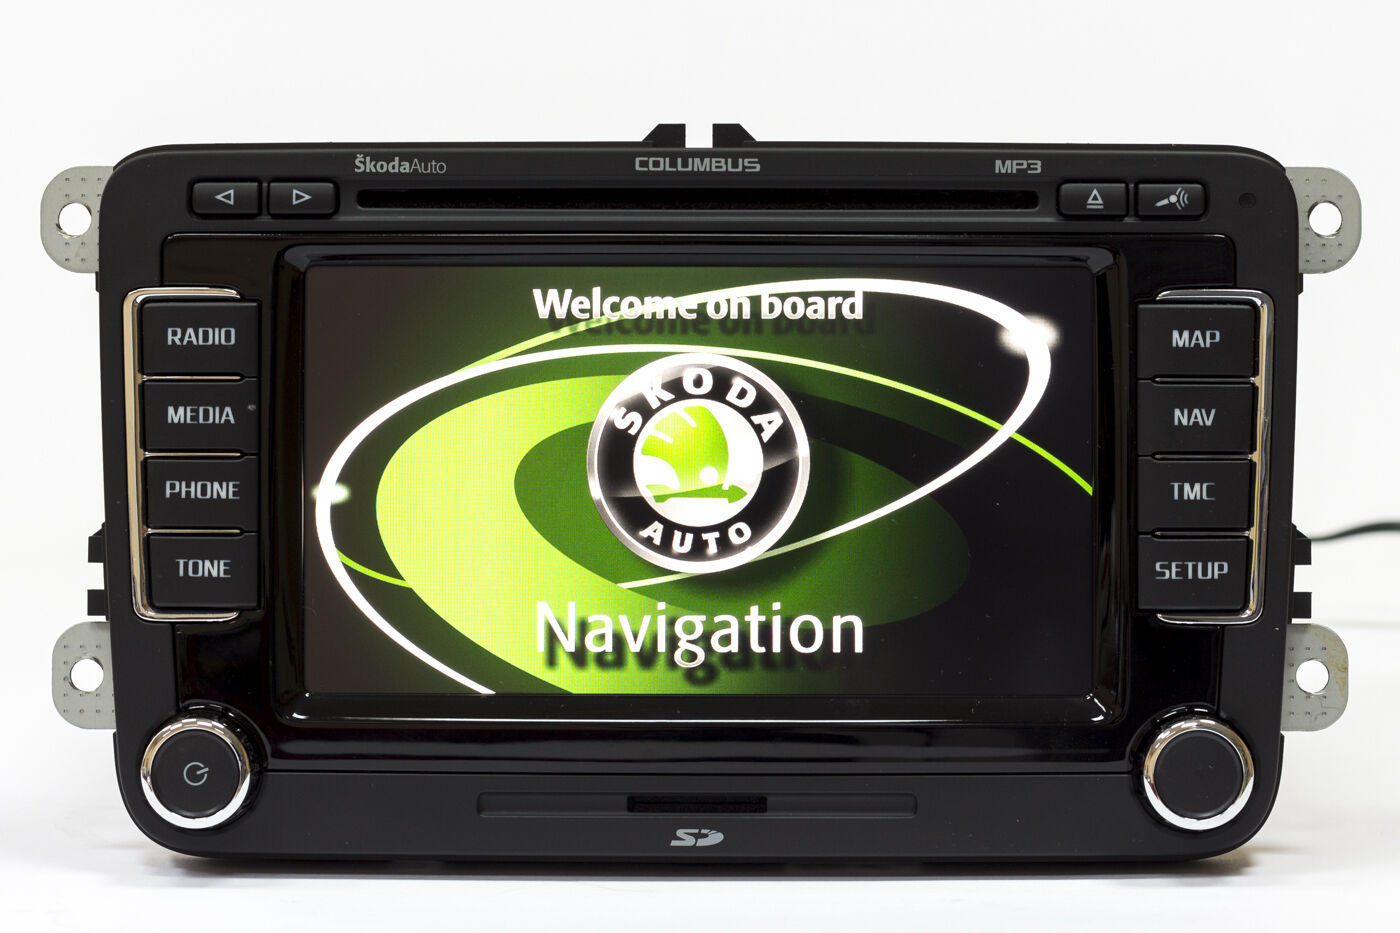 skoda columbus led v14 maps octavia 2004 2013 rns 510 gps navigation navi radio ebay. Black Bedroom Furniture Sets. Home Design Ideas